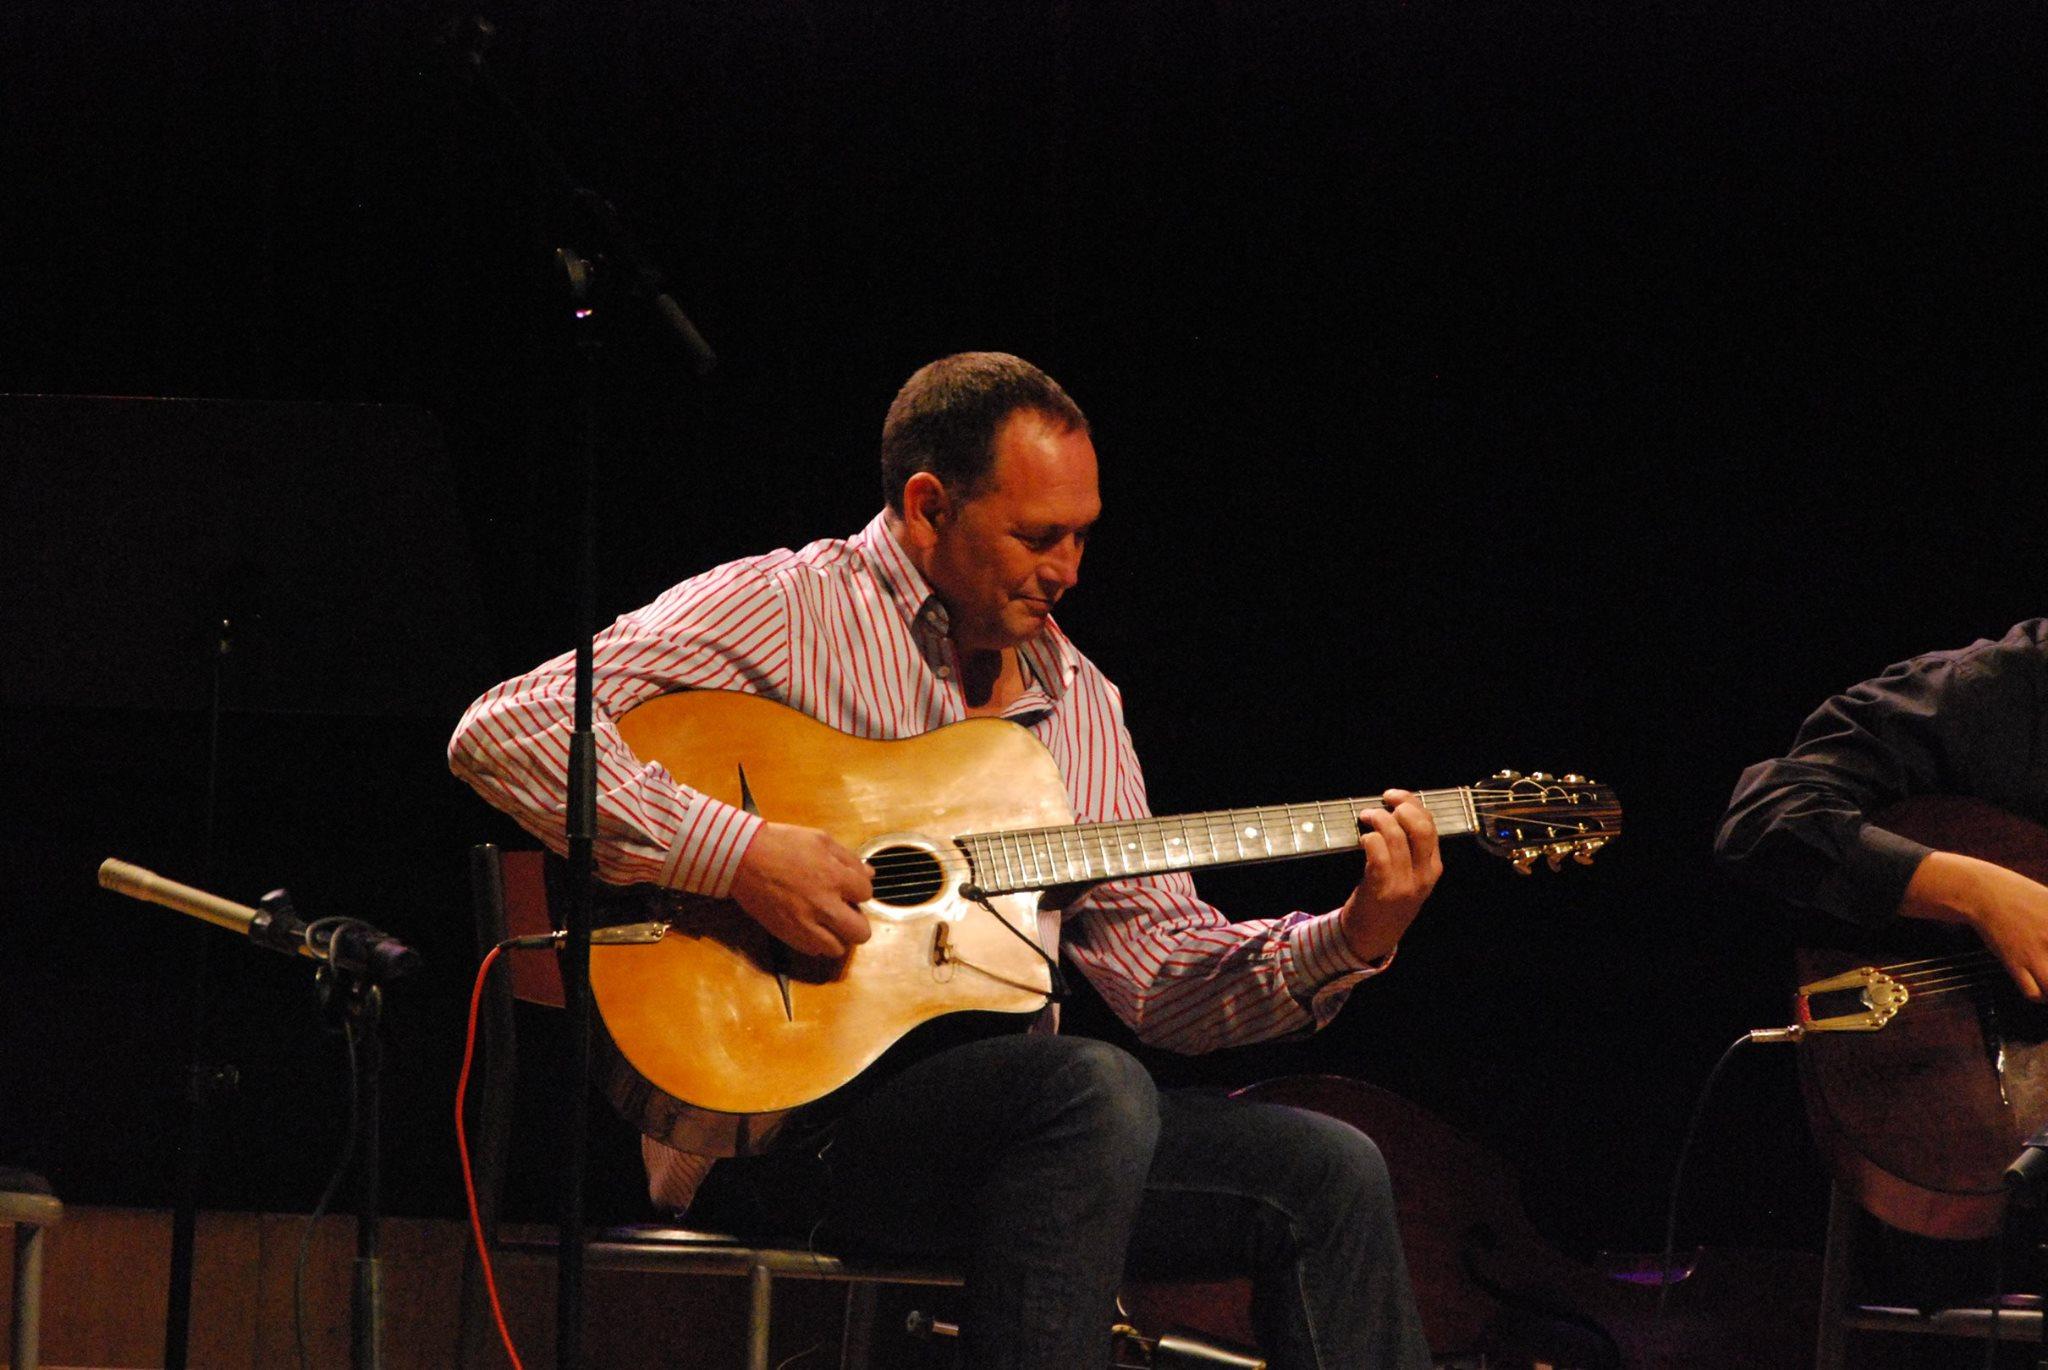 All-Stars-Gypsy-Band-presents-Django-Reinhardt-Legacy-Project_Vatroslav_Lisinski_4